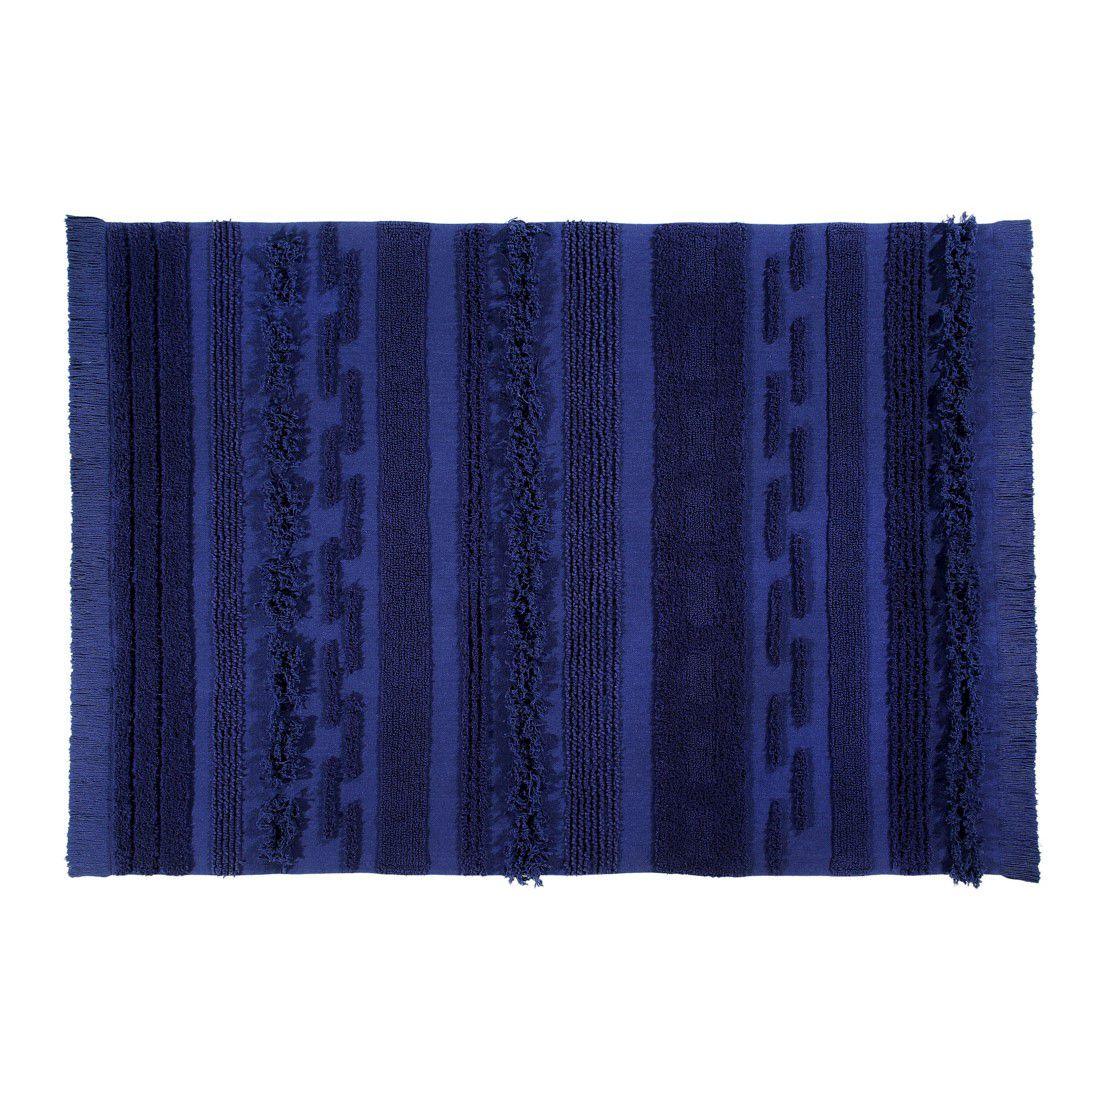 Tapete Lorena Canals Ar Alaska Blue G 170 x 240 cm